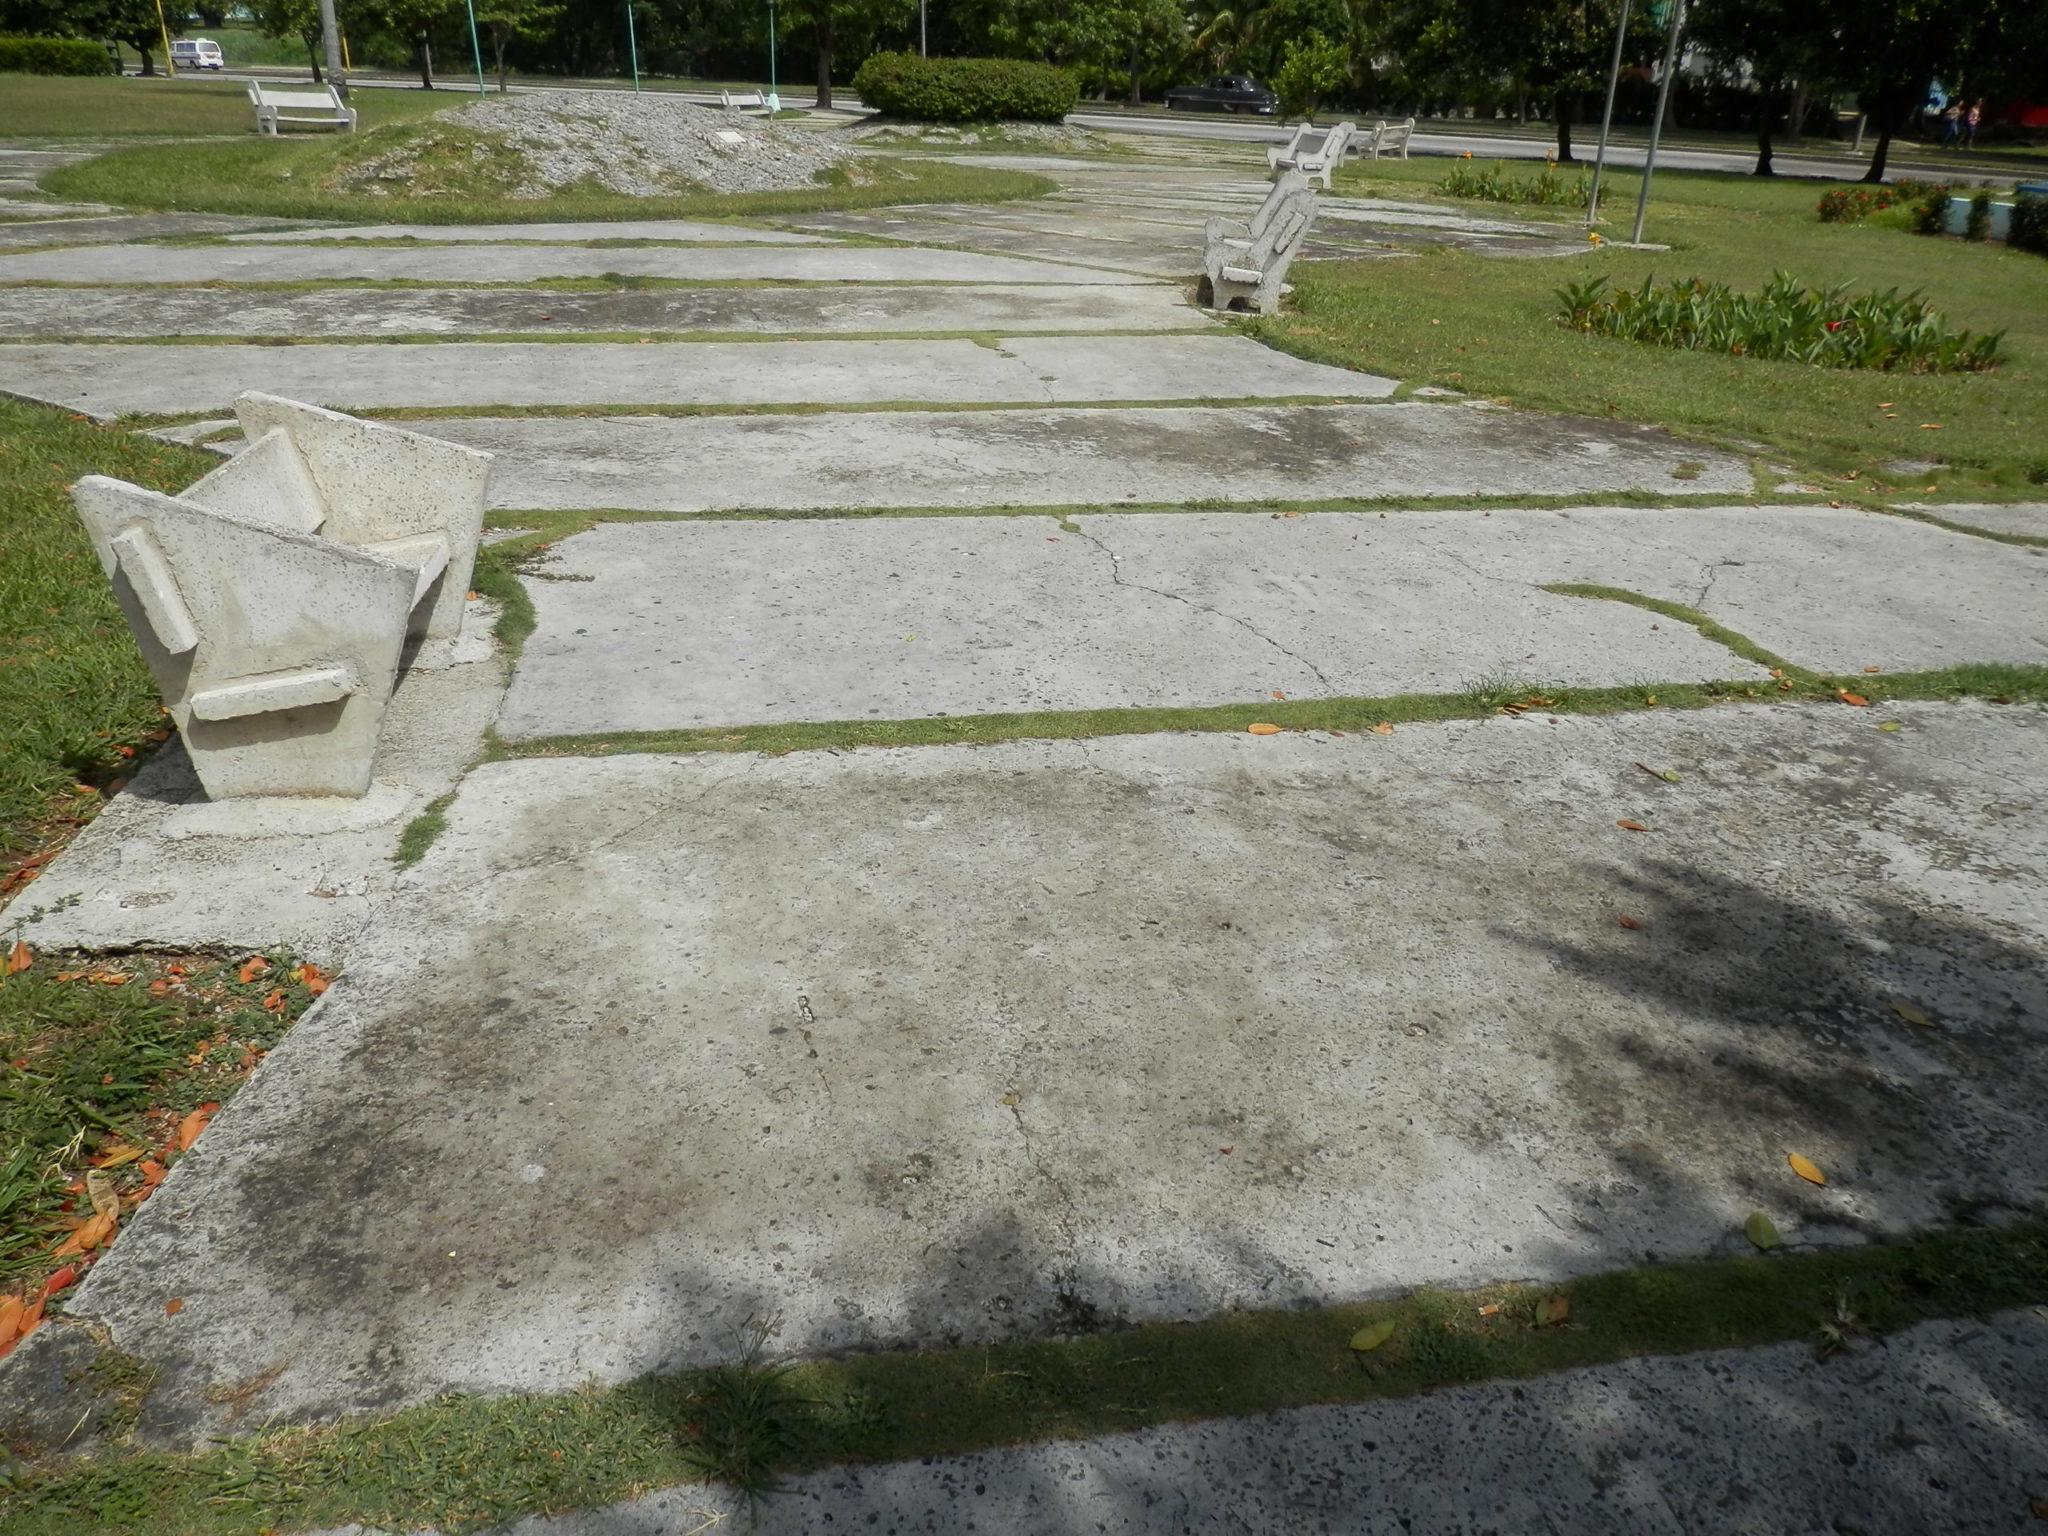 Parques preenchidos por concreto.